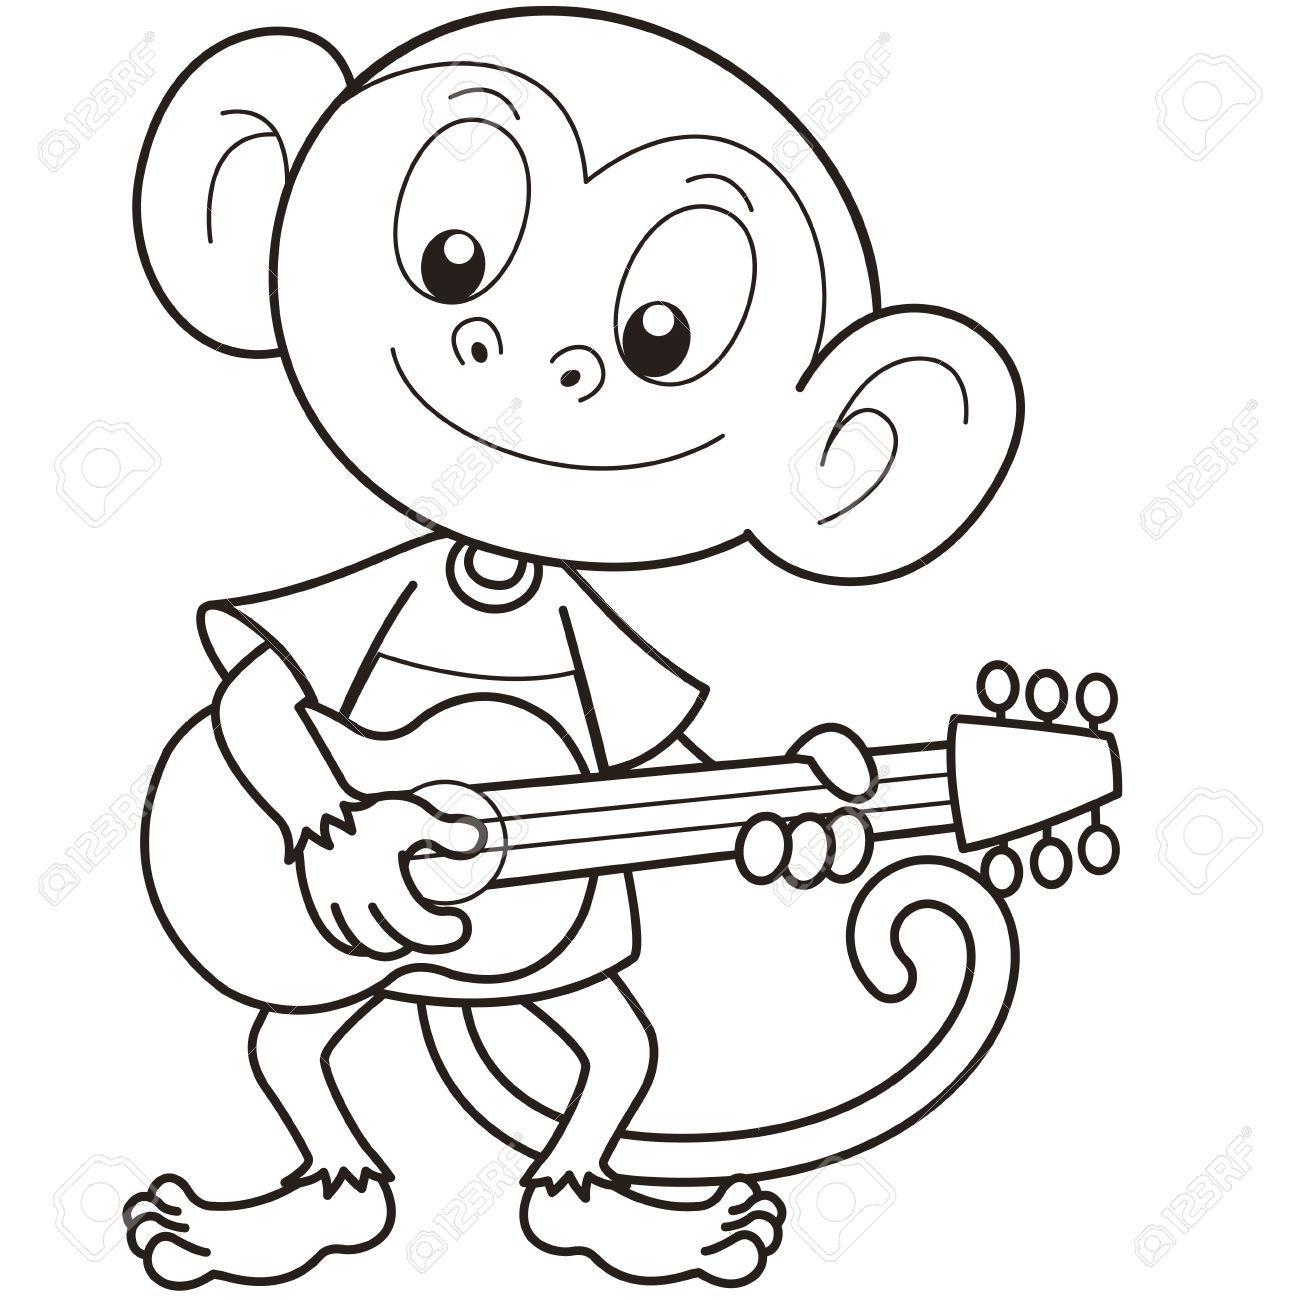 Stock Vector Cartoon monkey, Music drawings, Monkey tattoos